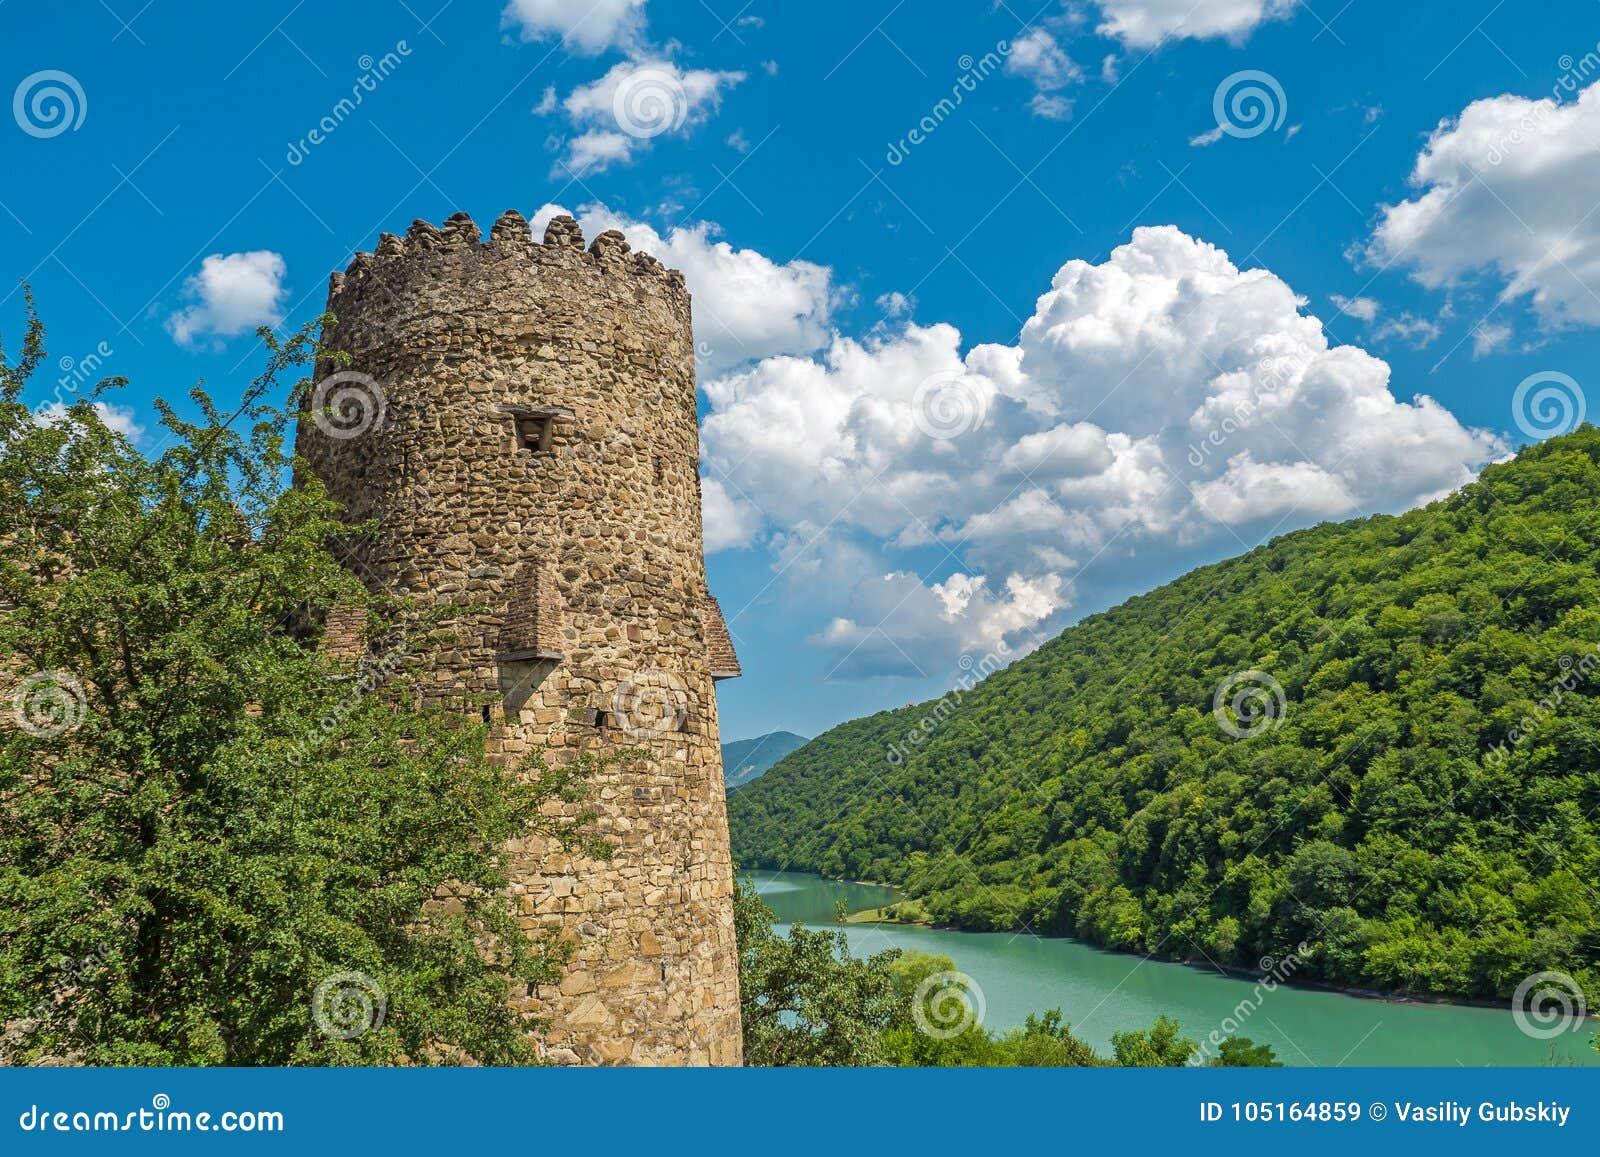 Alter Turm der Festung